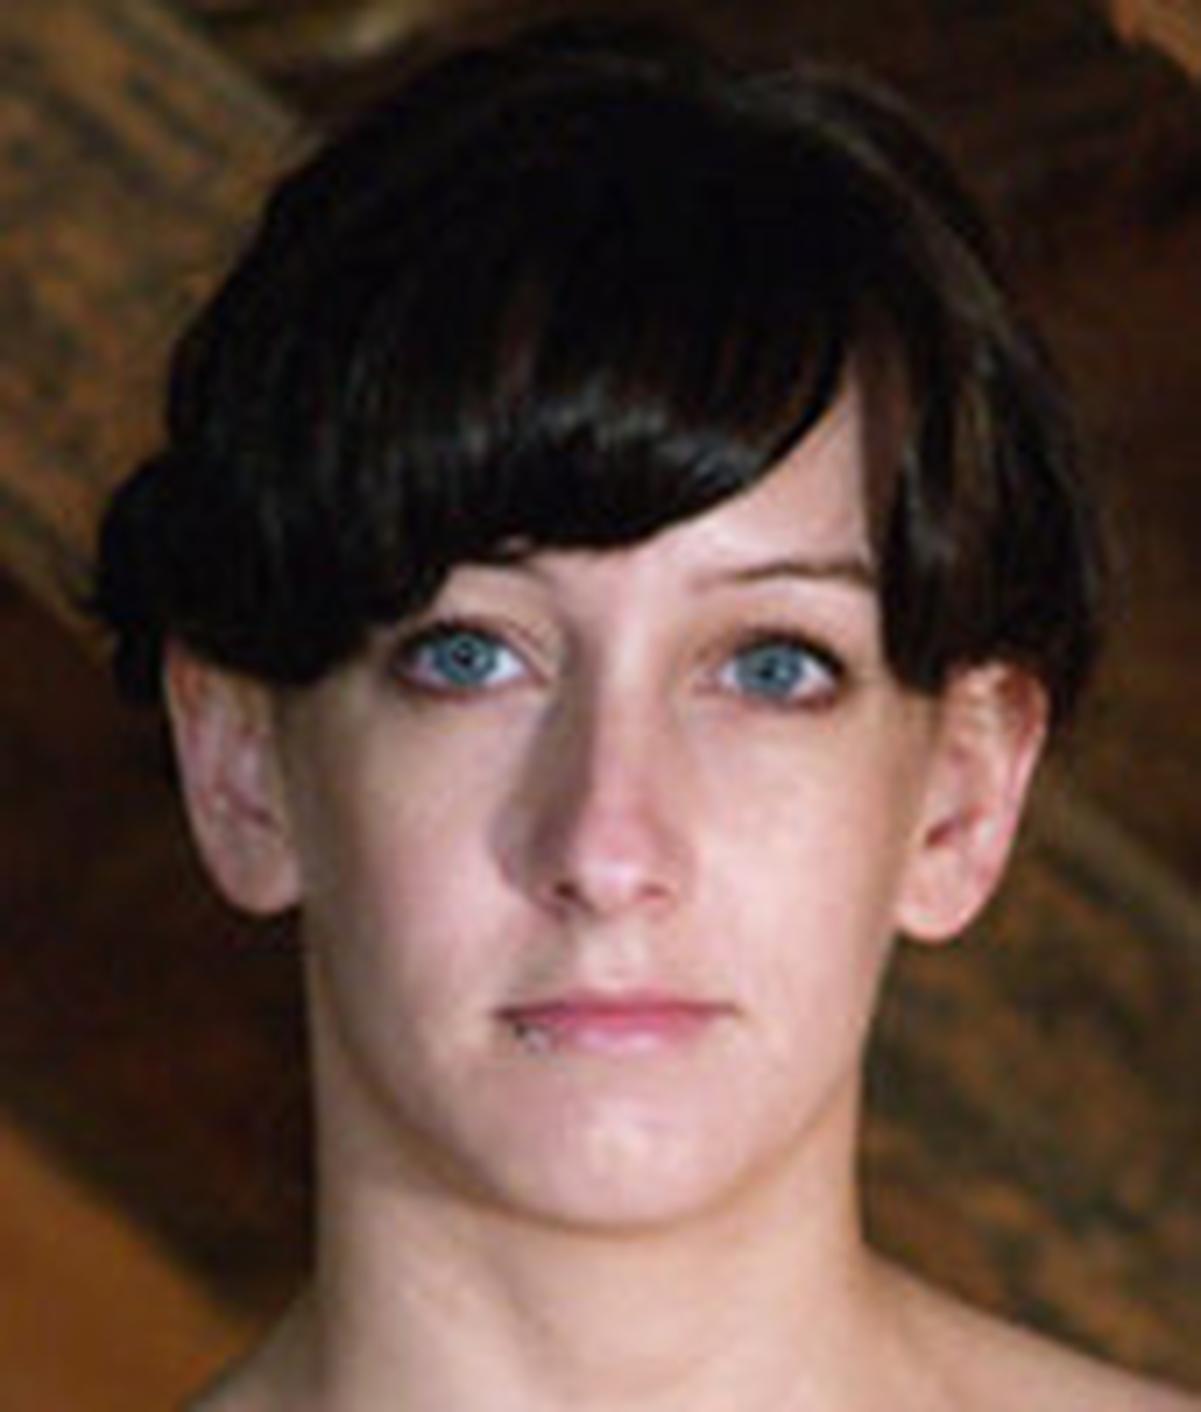 Elise Graves | Wiki | Everipedia